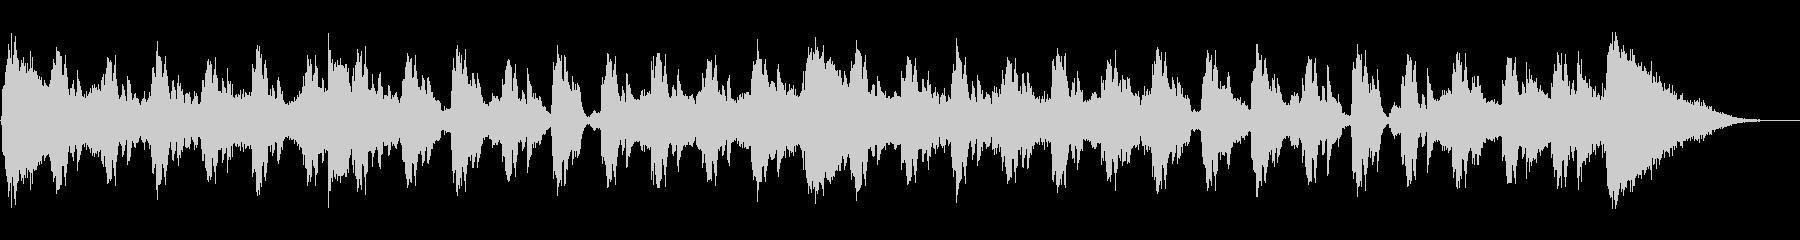 acidなジングルの未再生の波形